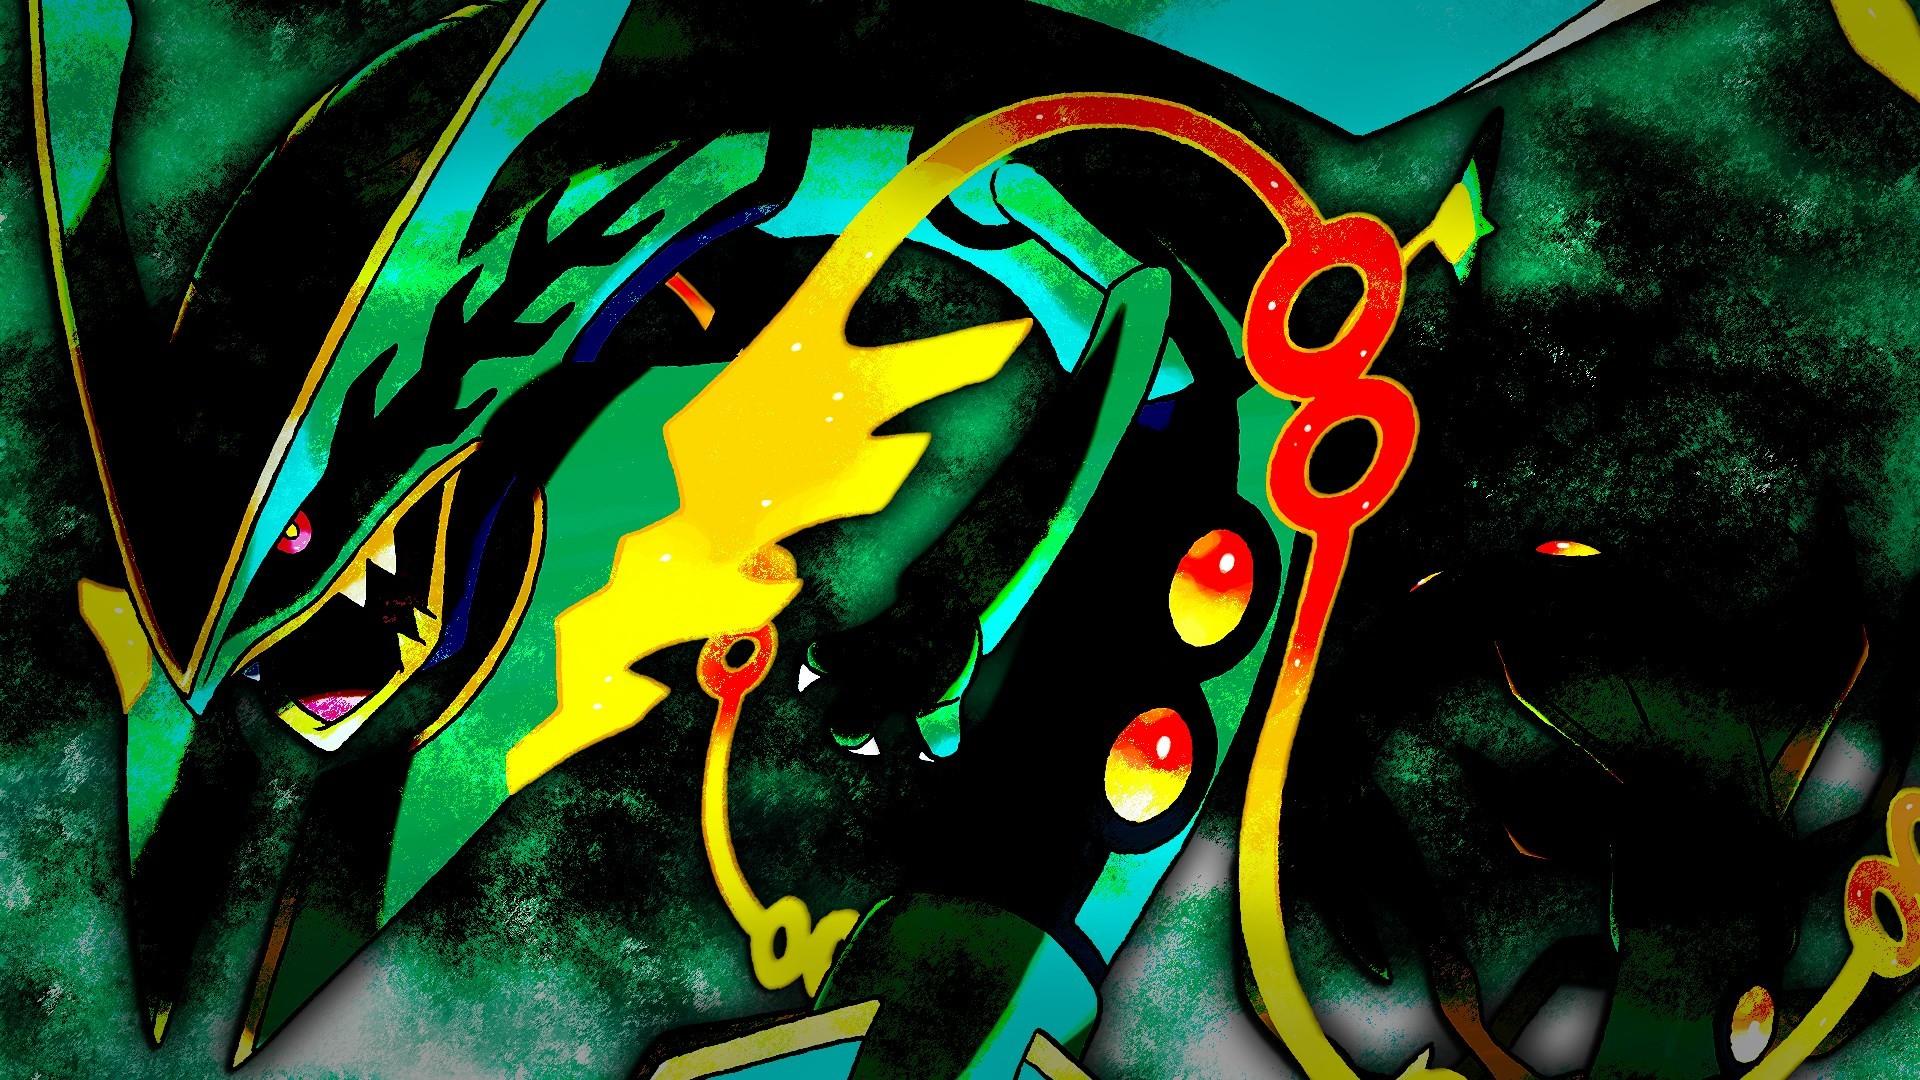 mega rayquaza wallpaper mega rayquaza wallpaper